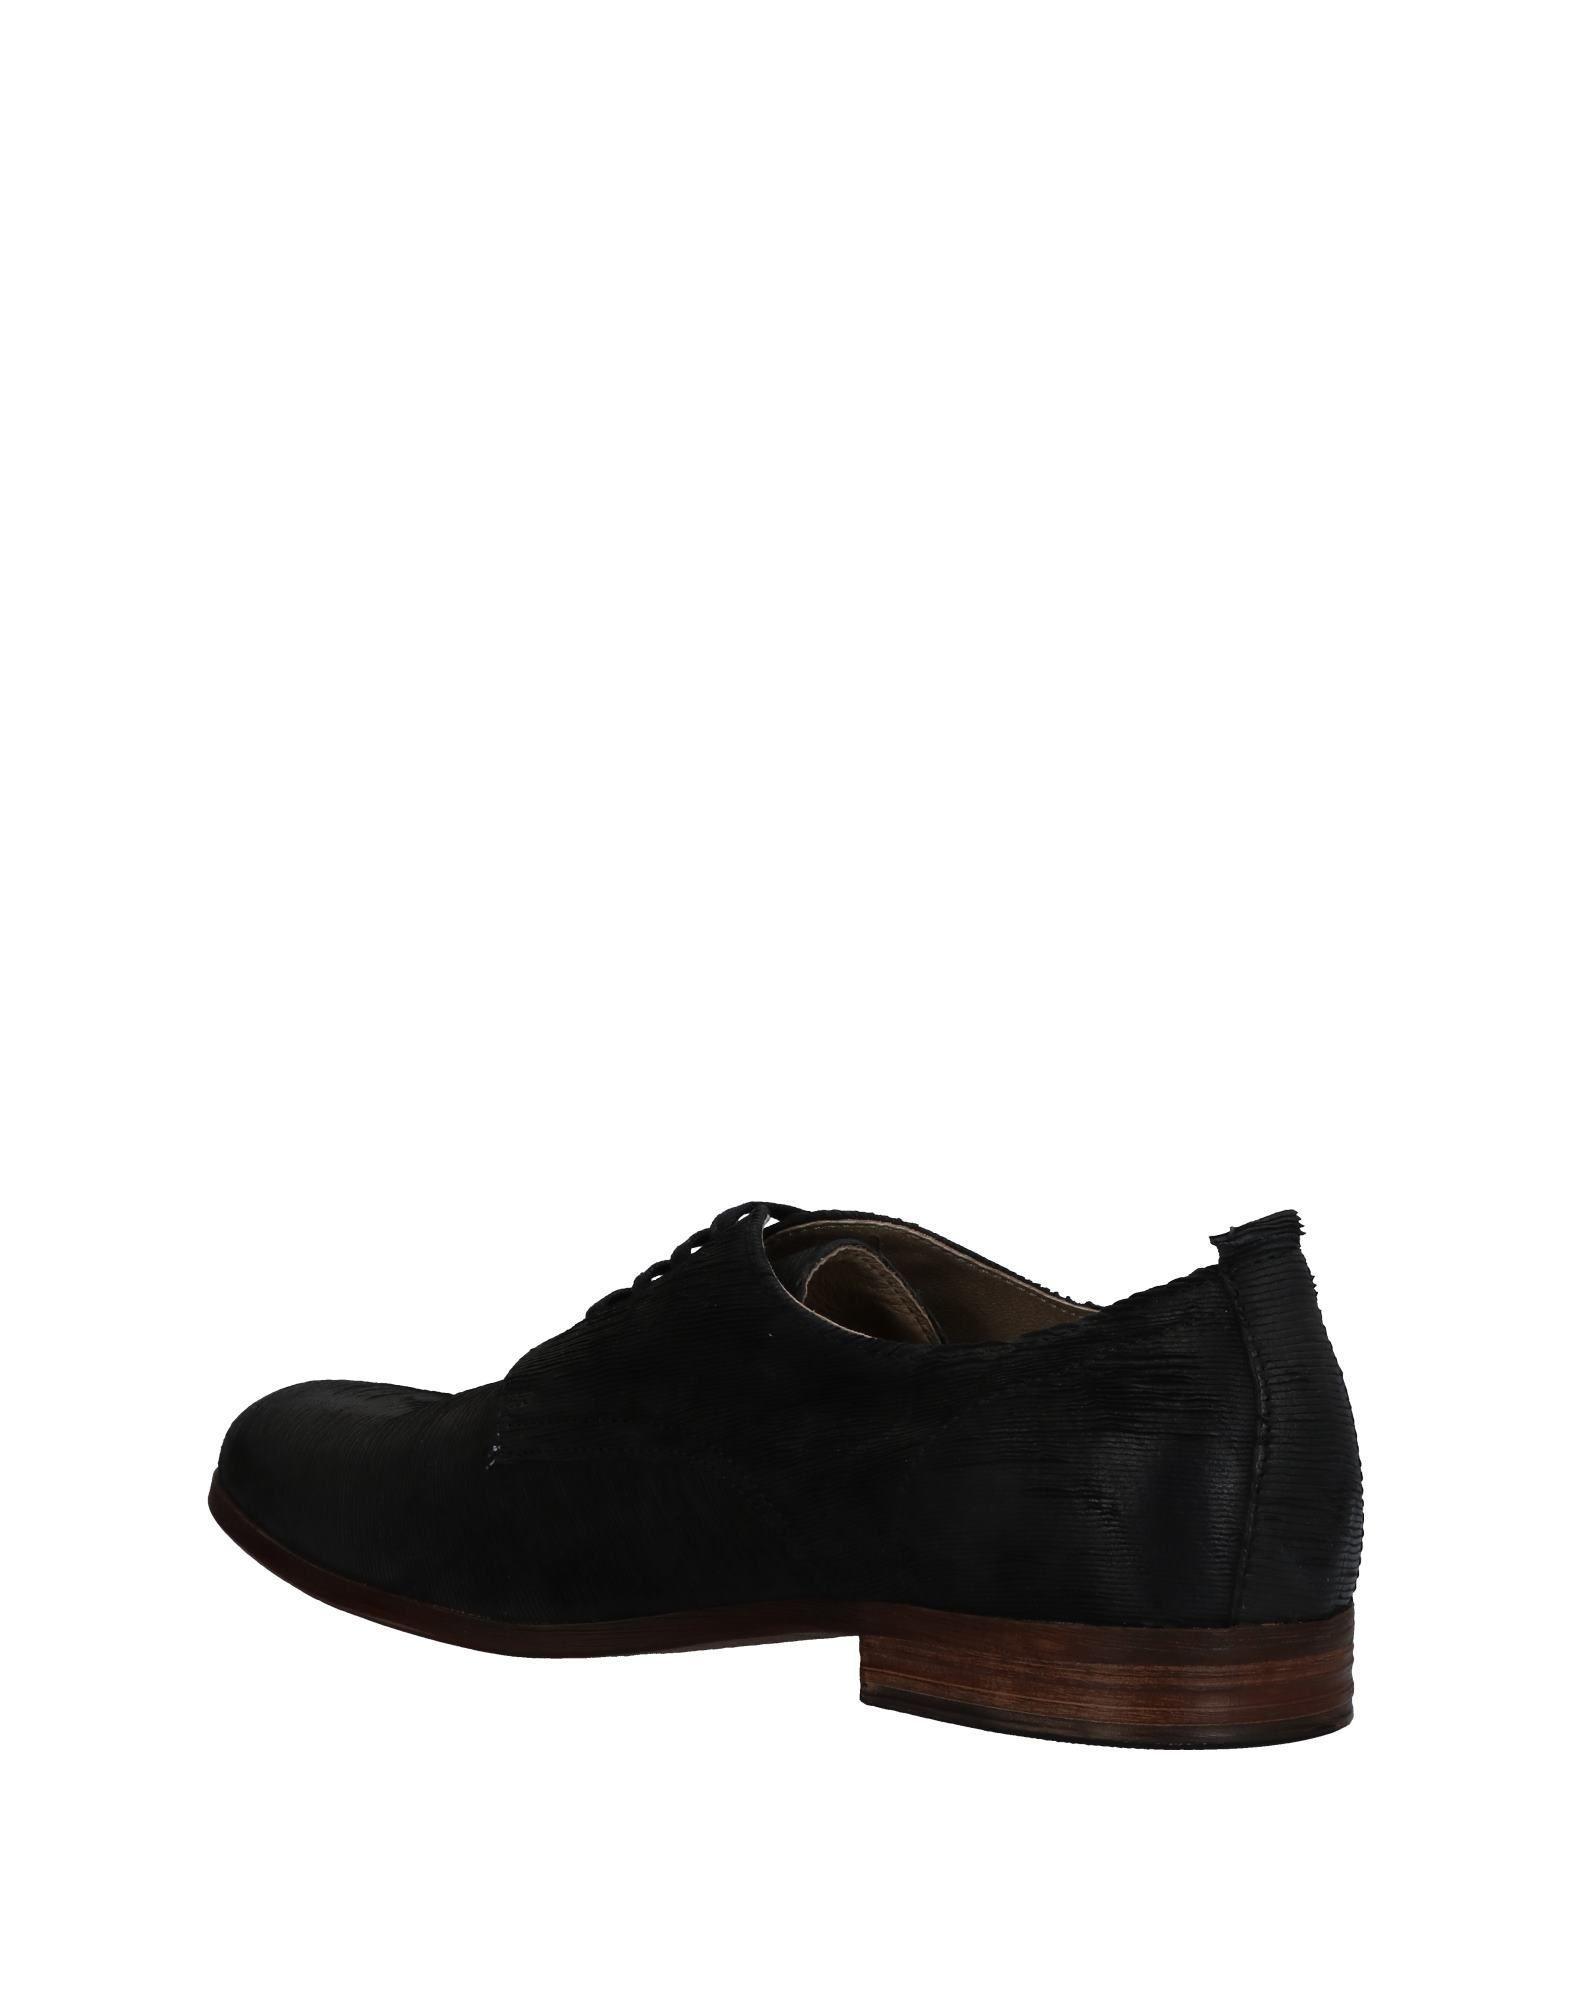 Fabbrica Deicolli Chaussures À Lacets eNW7oj